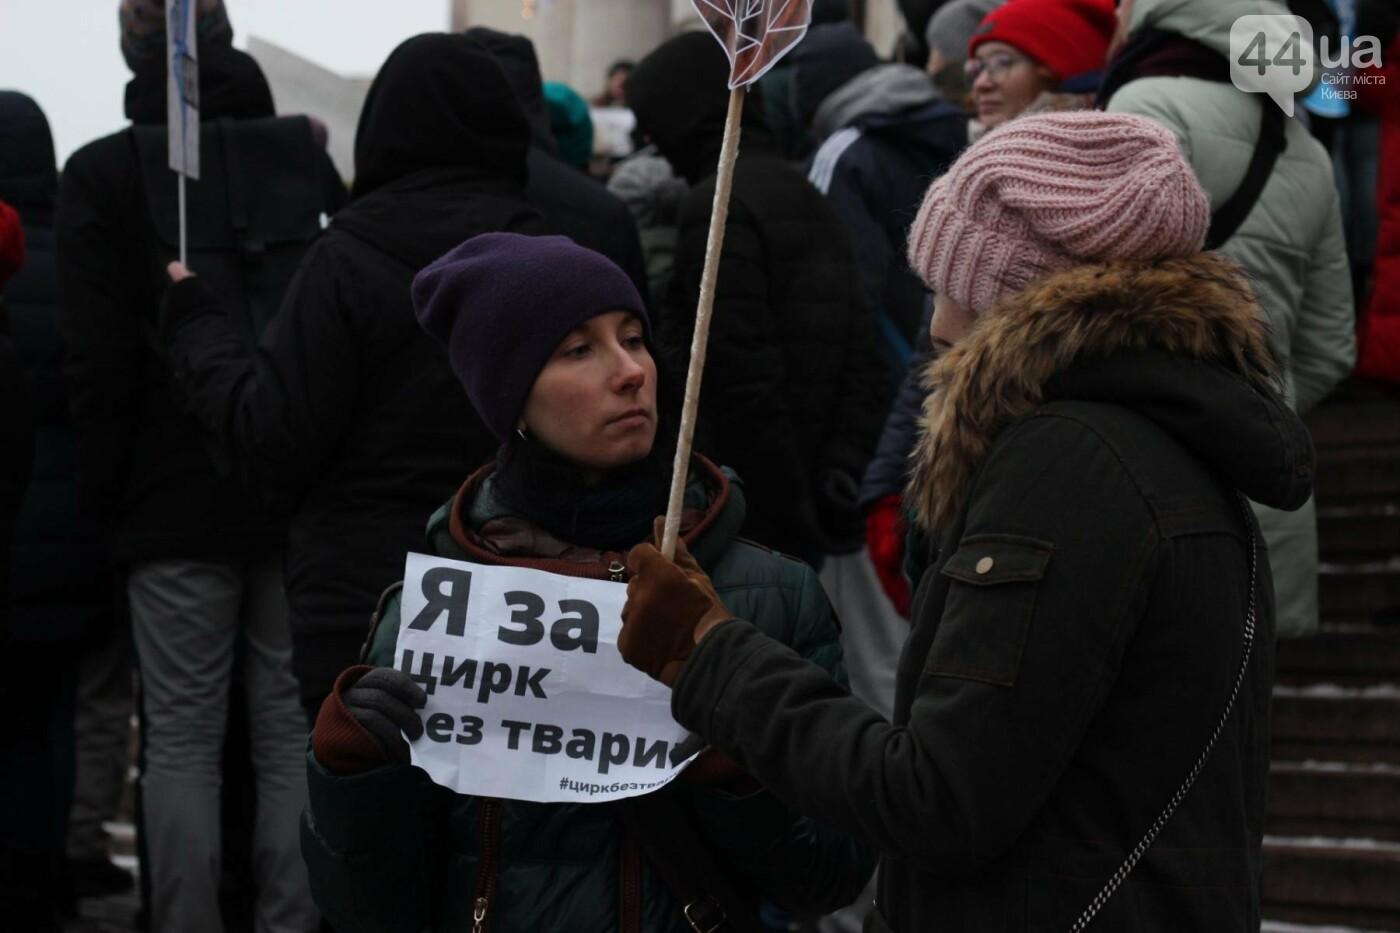 Цирк без животных: как в Киеве прошла акция протеста, фото-12